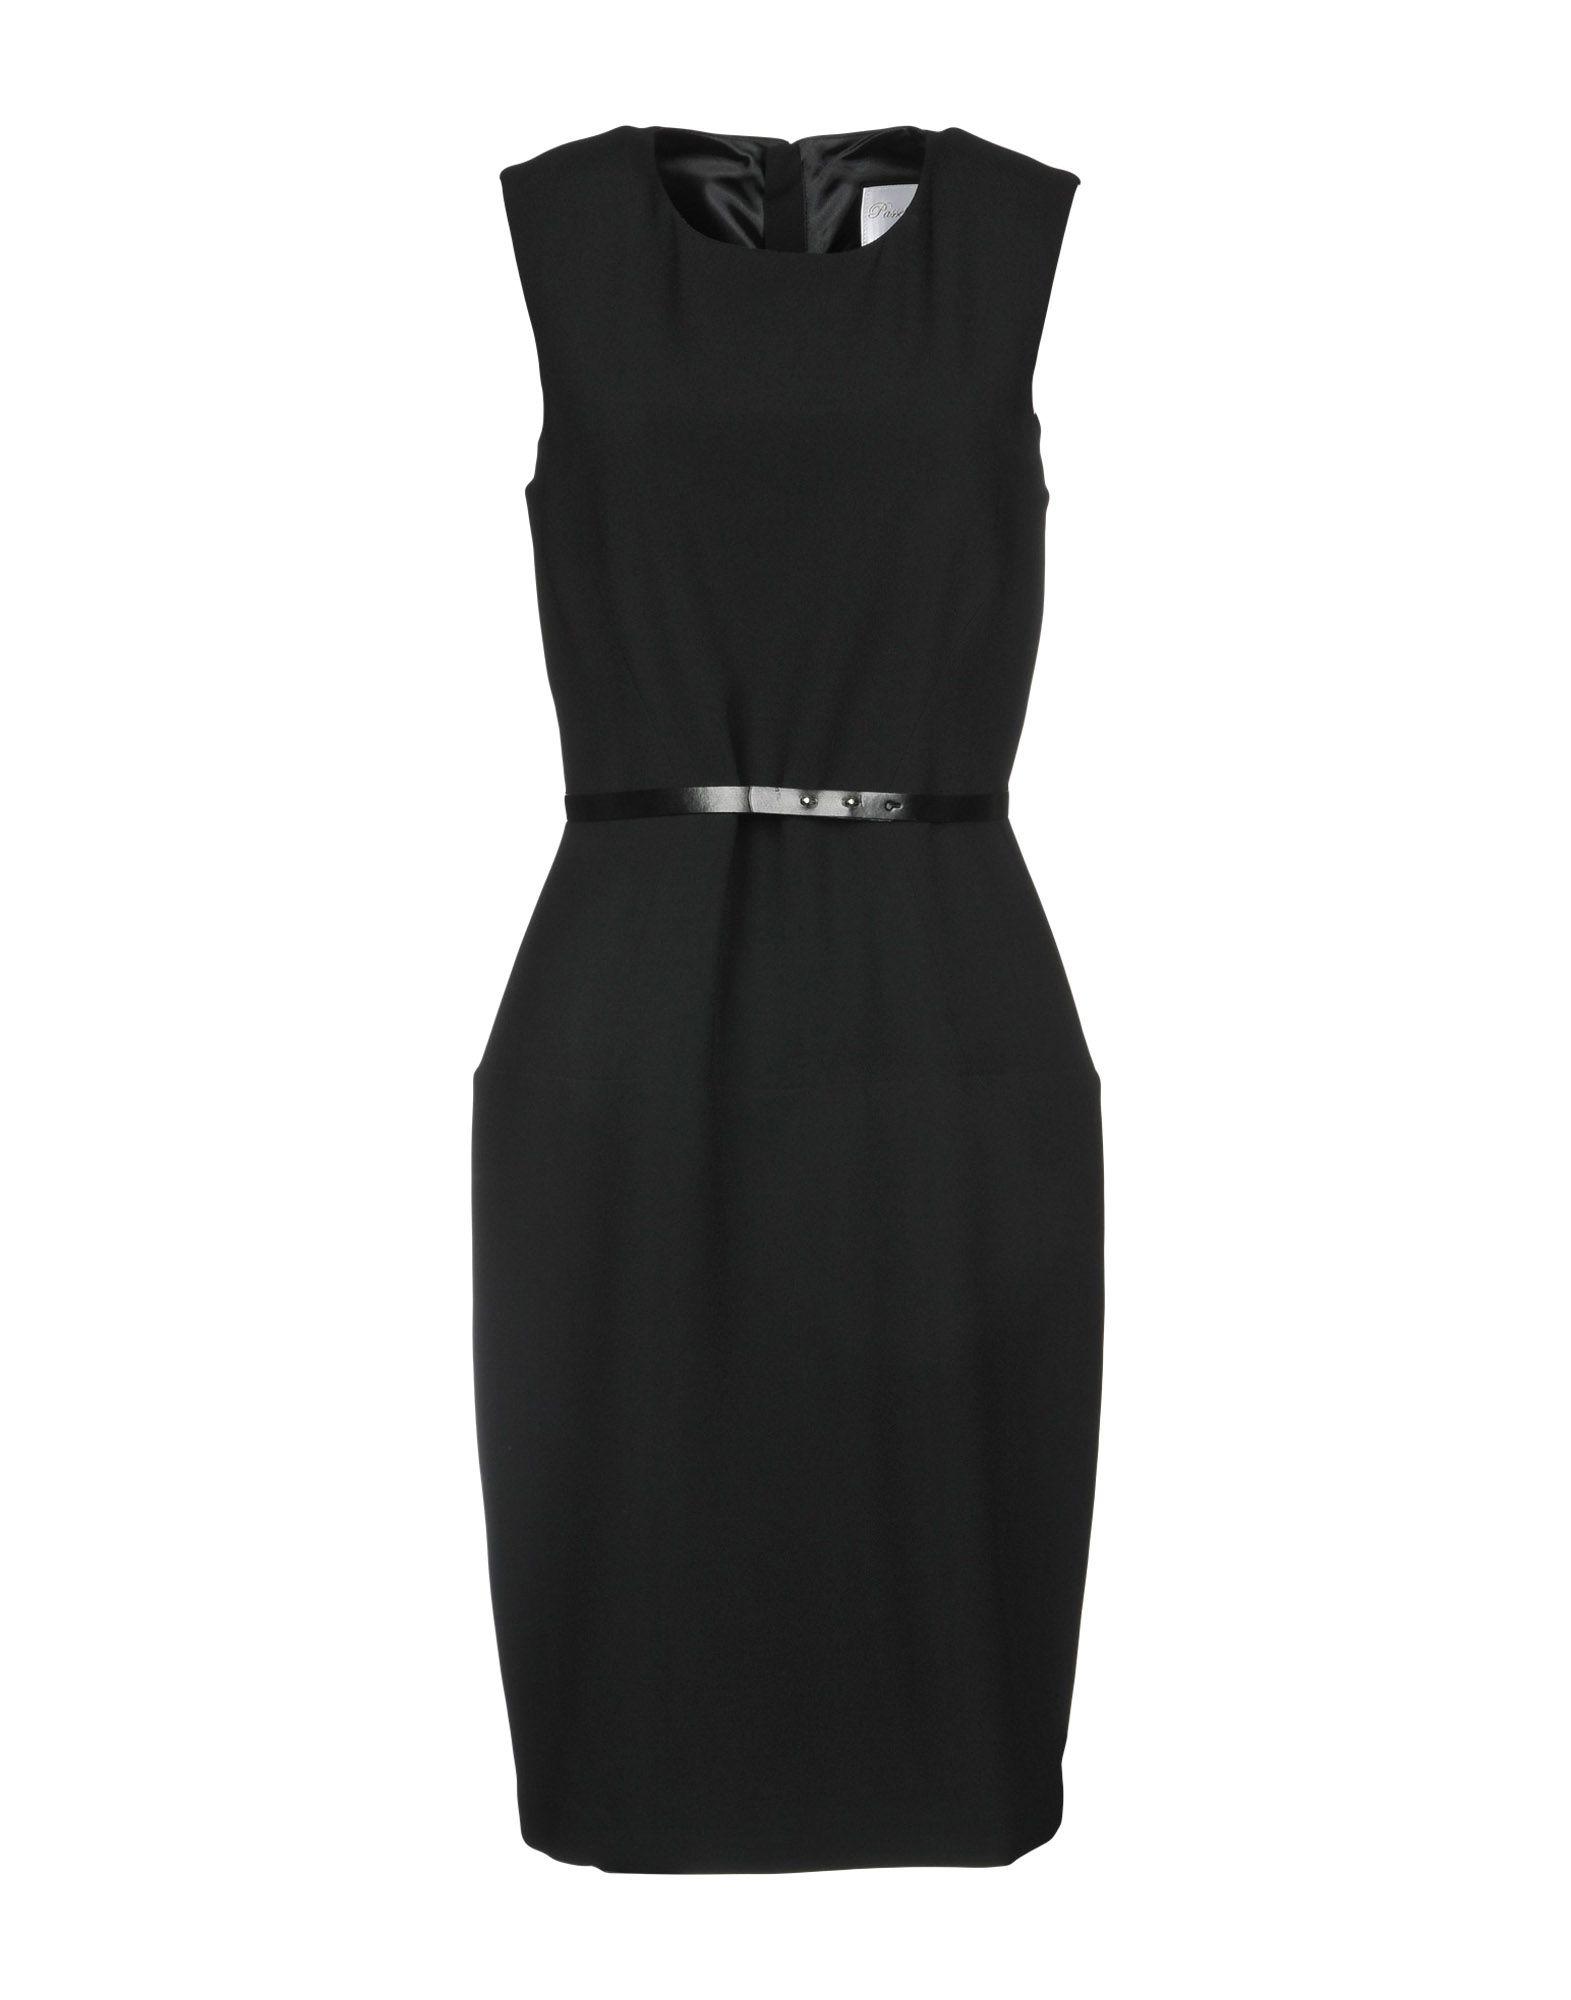 PASSEPARTOUT DRESS by ELISABETTA FRANCHI CELYN b. Платье до колена пуловер quelle b c best connections by heine 137654